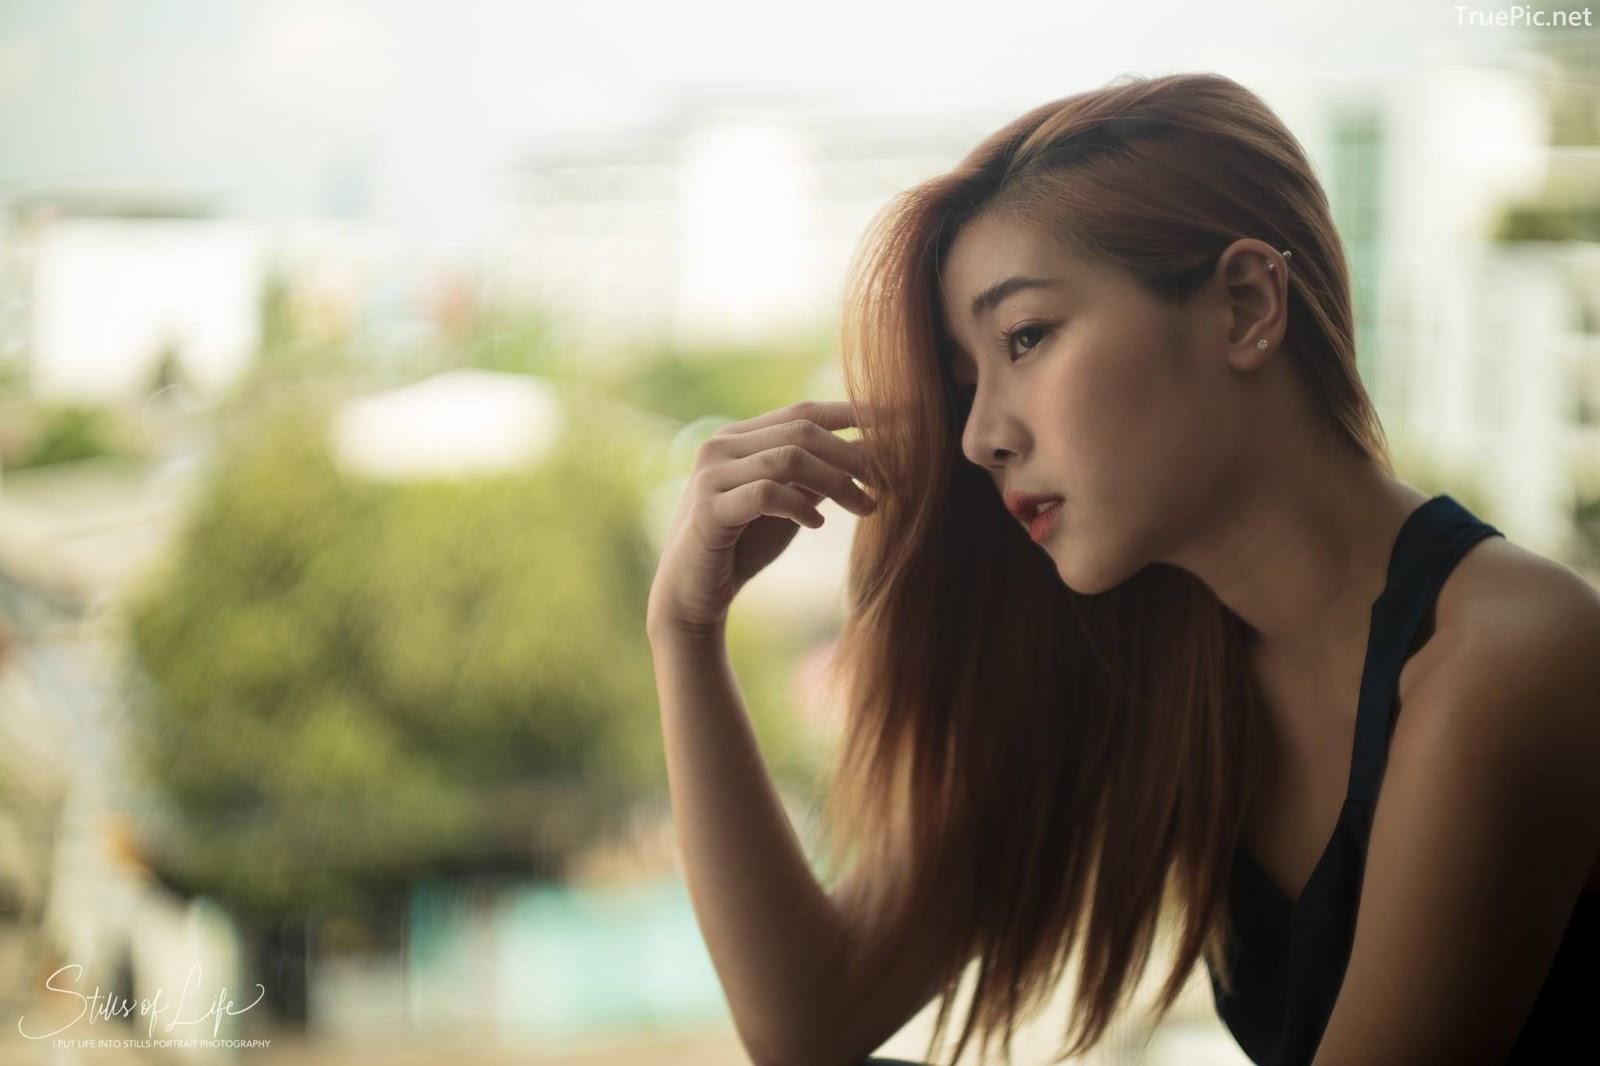 Thailand model Bunnada Na Ranong - Waiting for you - Photographer Apisak Kanjanapusit